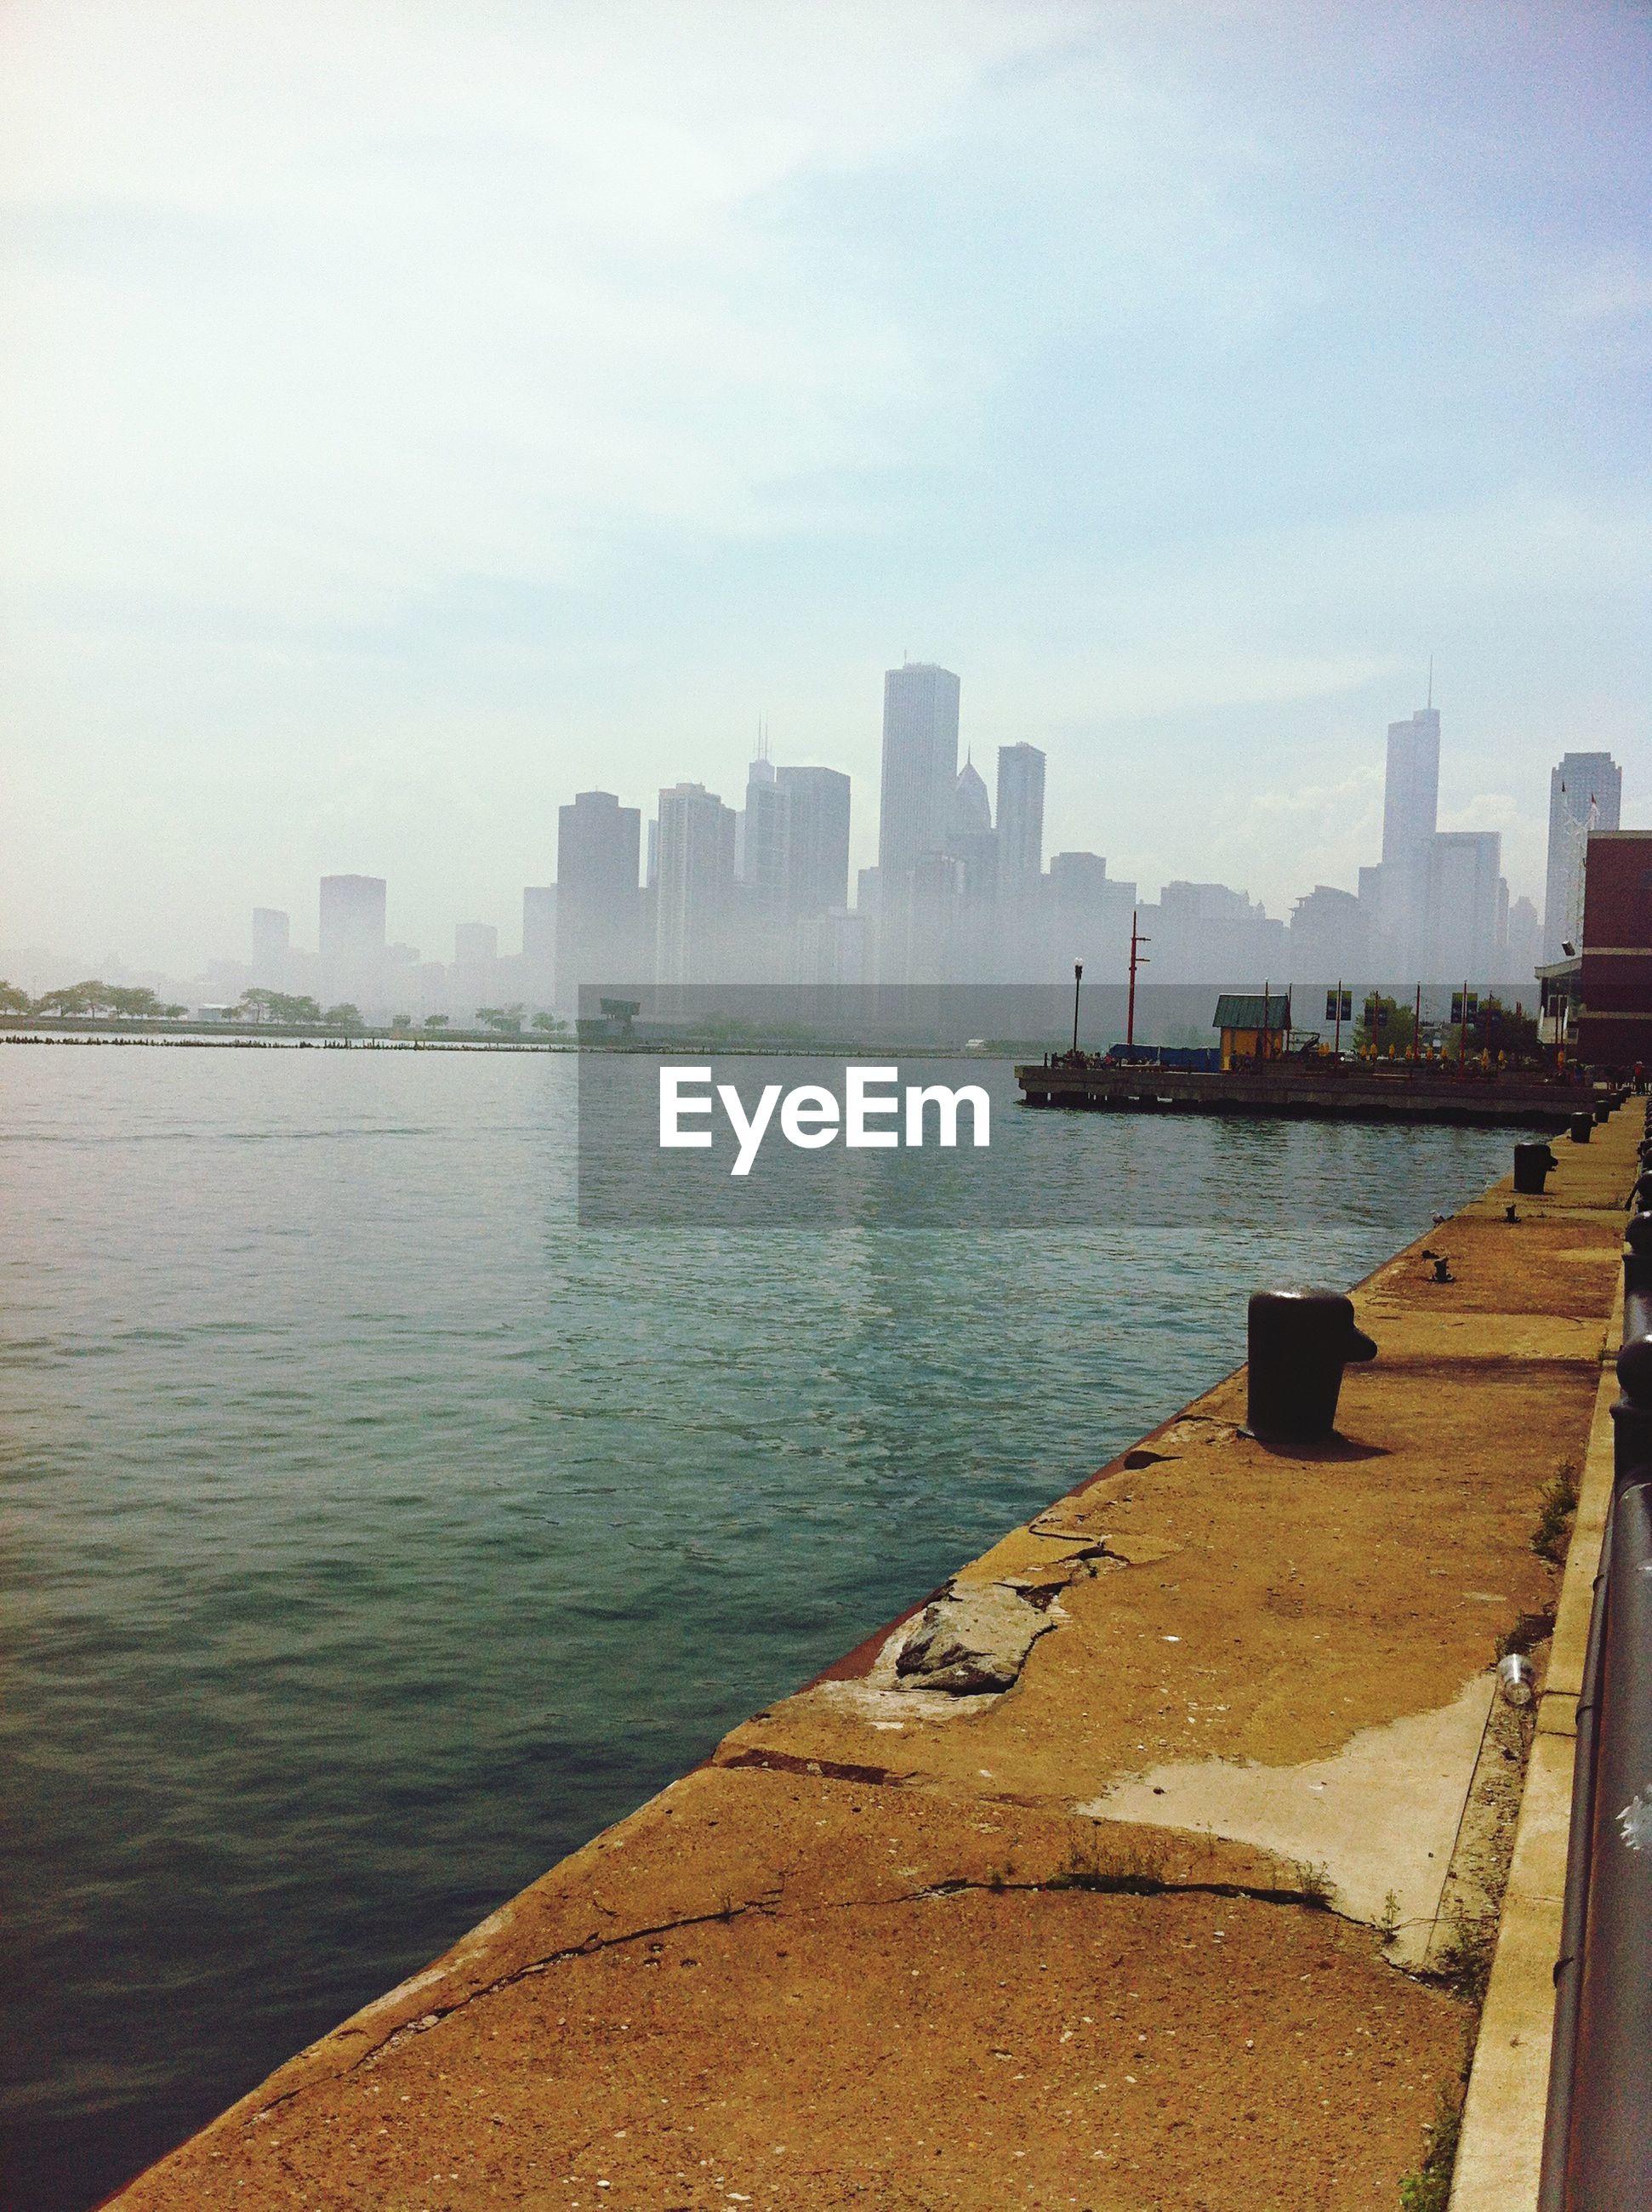 SEA BY CITY AGAINST SKY